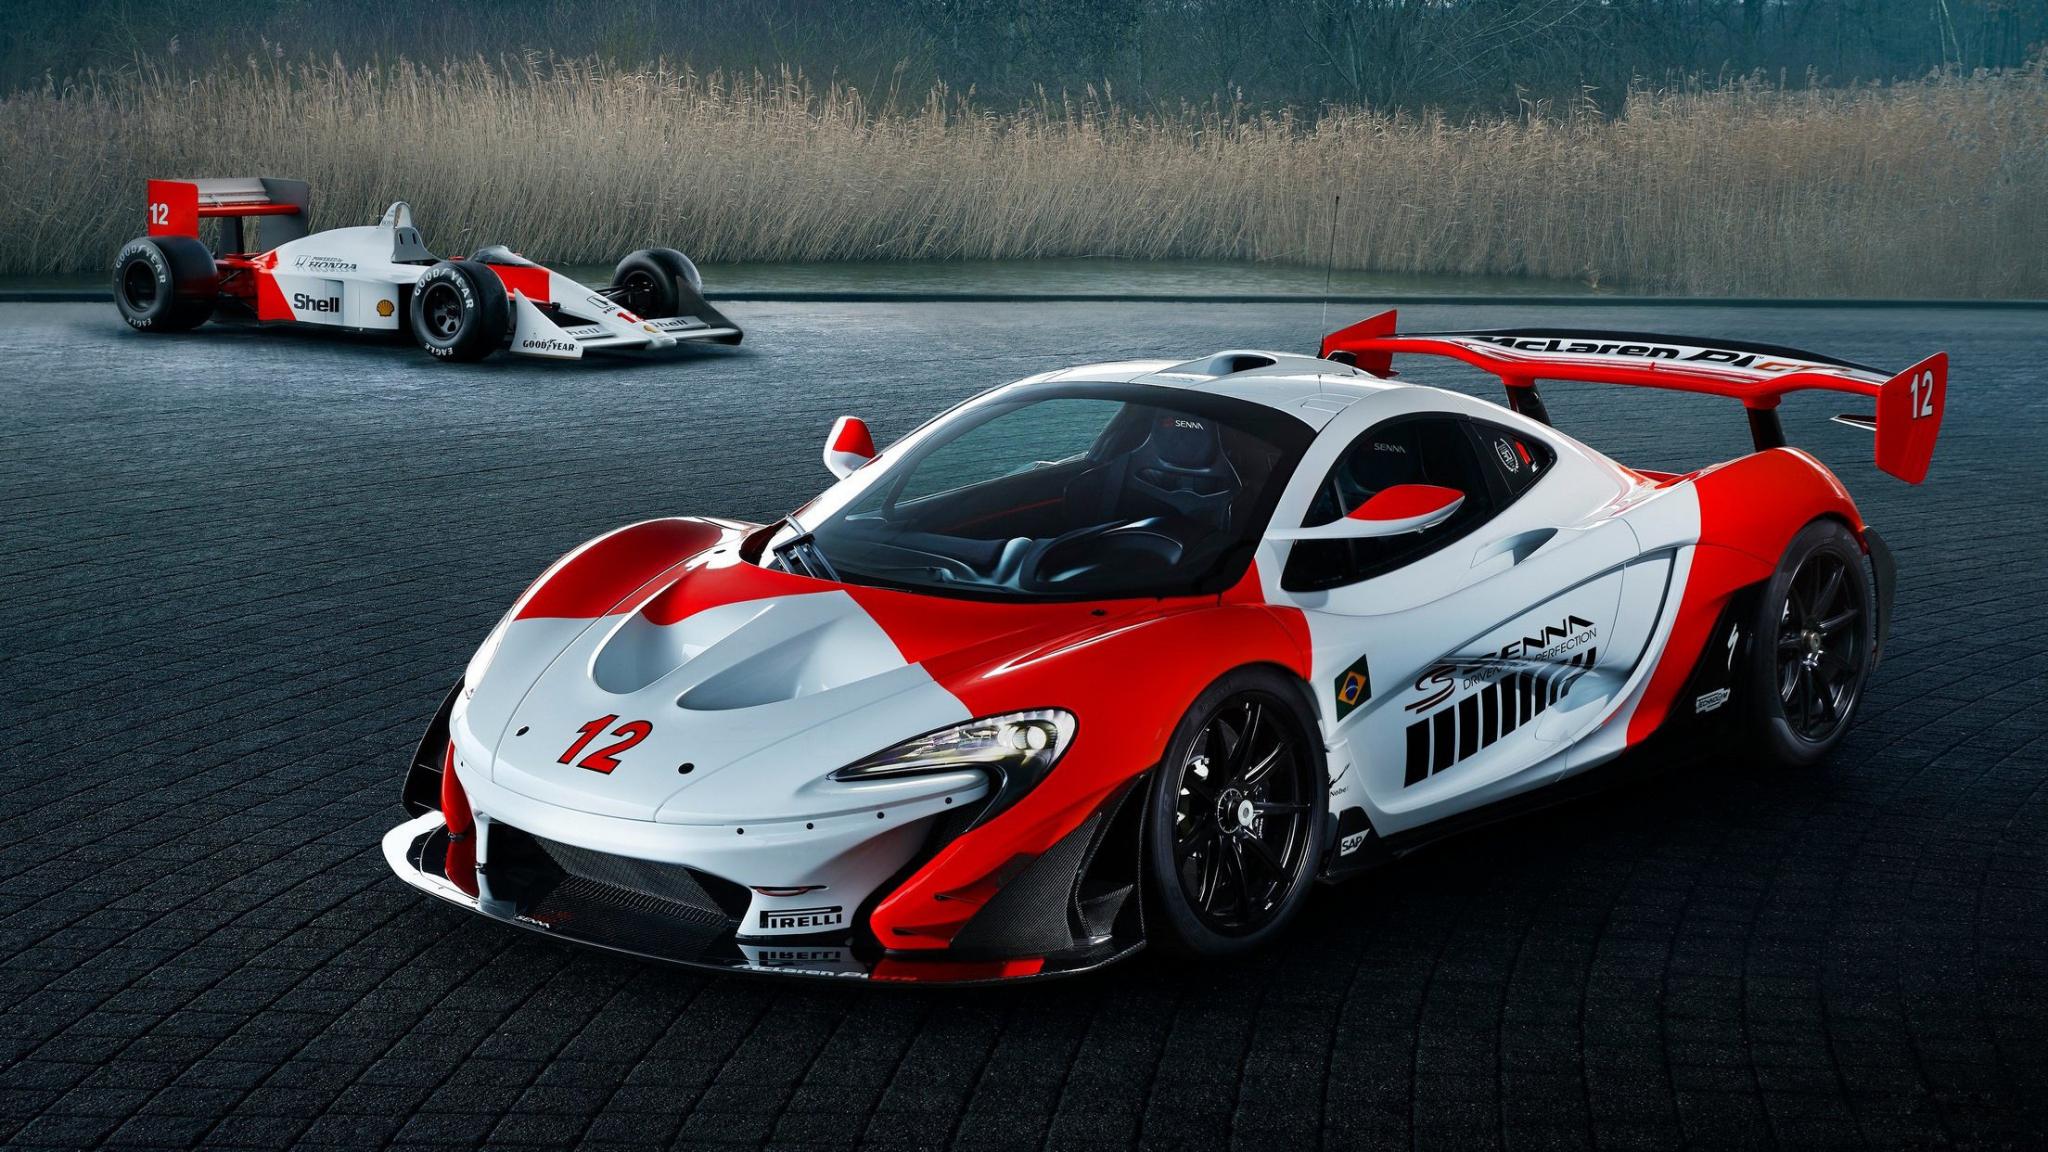 Download 2048x1152 Wallpaper Race Car Mclaren P1 Gtr Dual